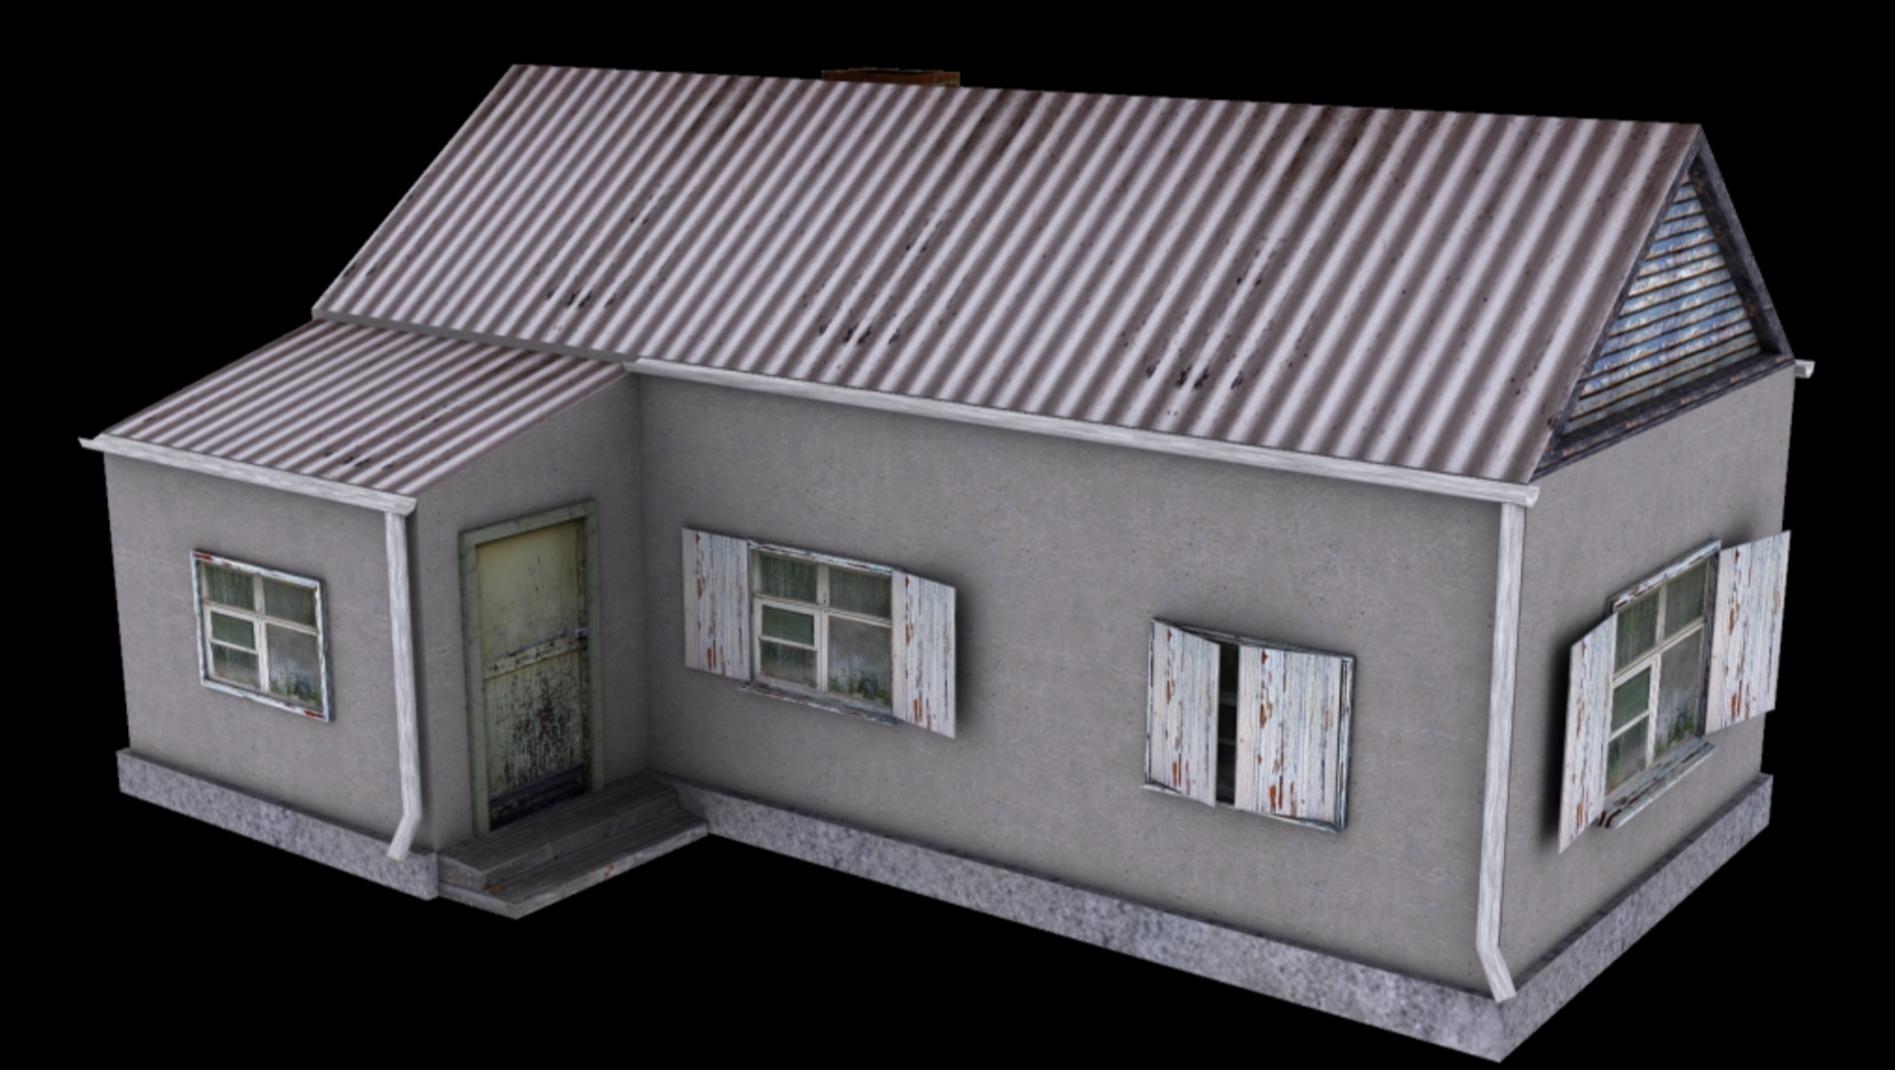 Fs17 house farming simulator 2017 2015 15 17 ls mod for House creator simulator